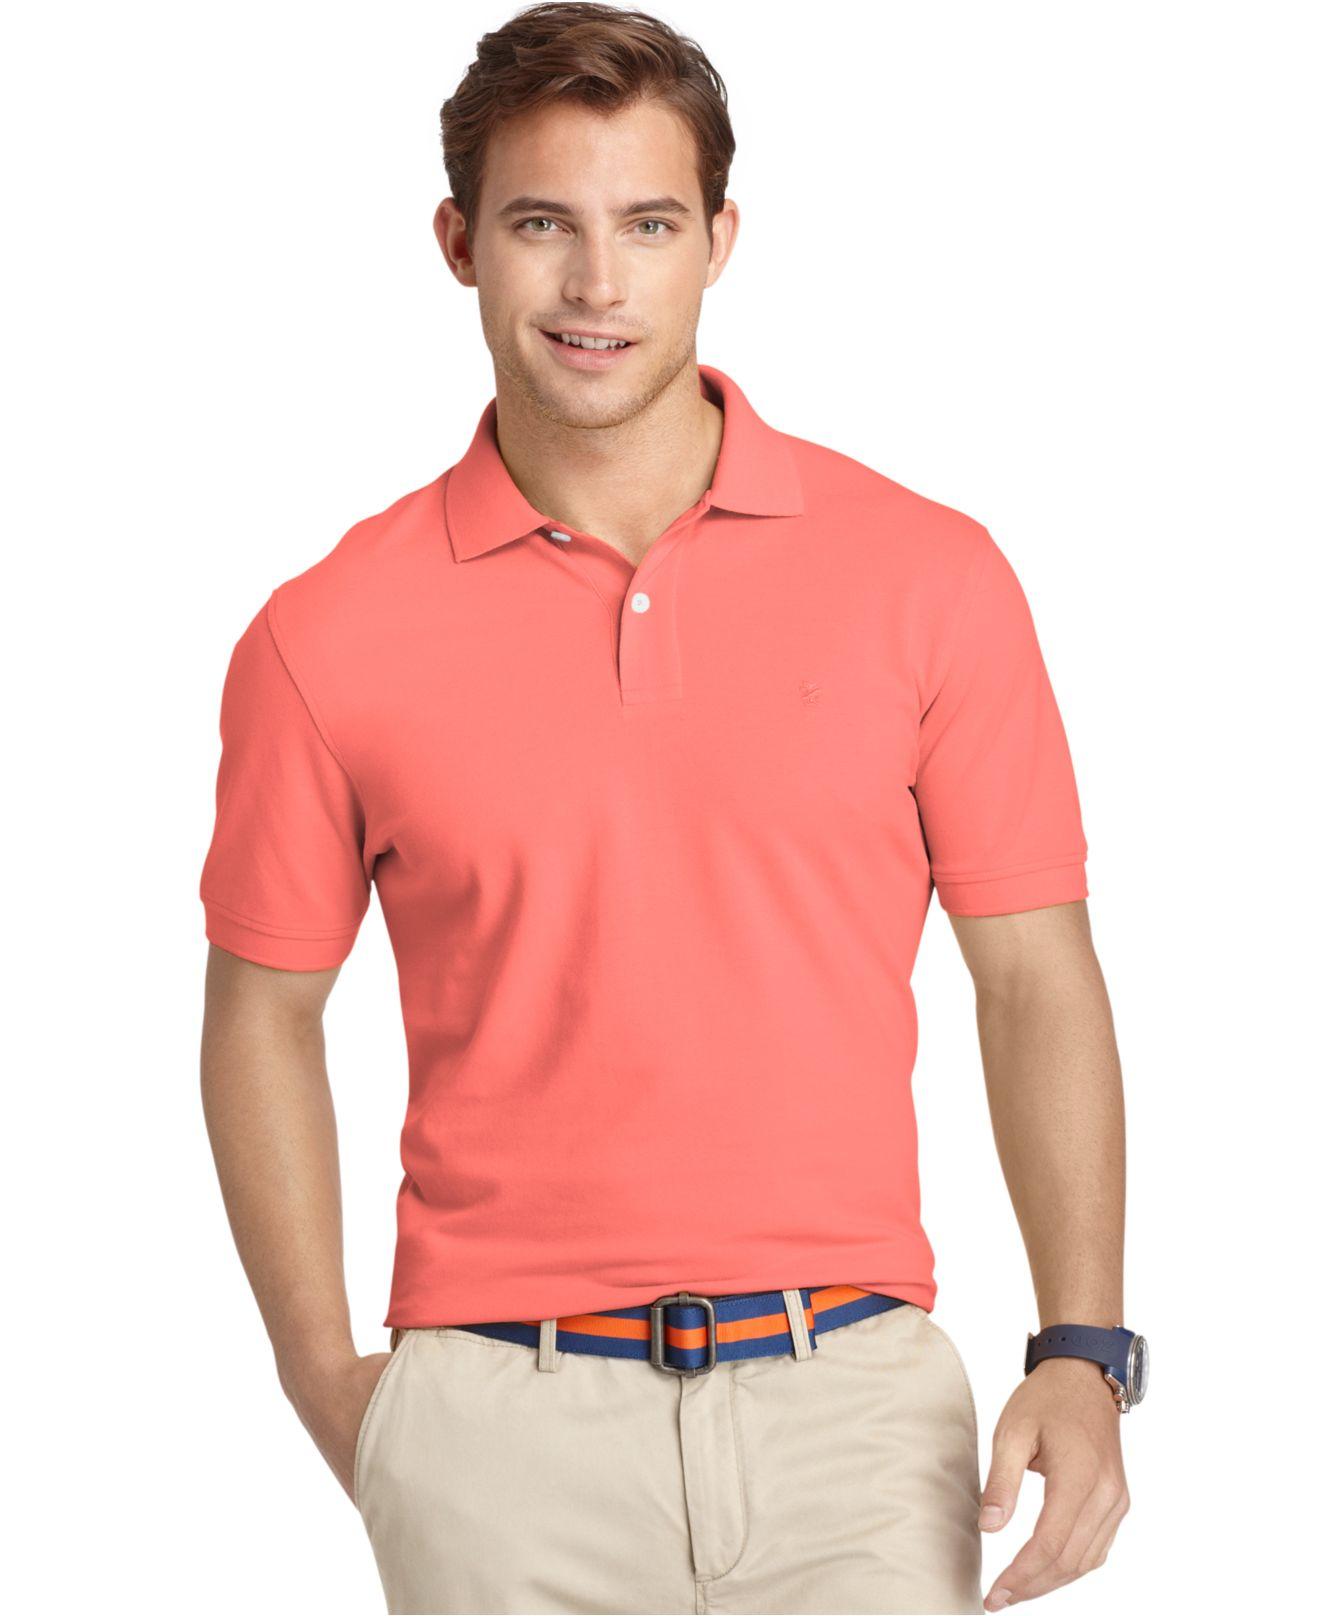 Lyst izod big and tall shirt short sleeve pique polo in for Izod big and tall shirts